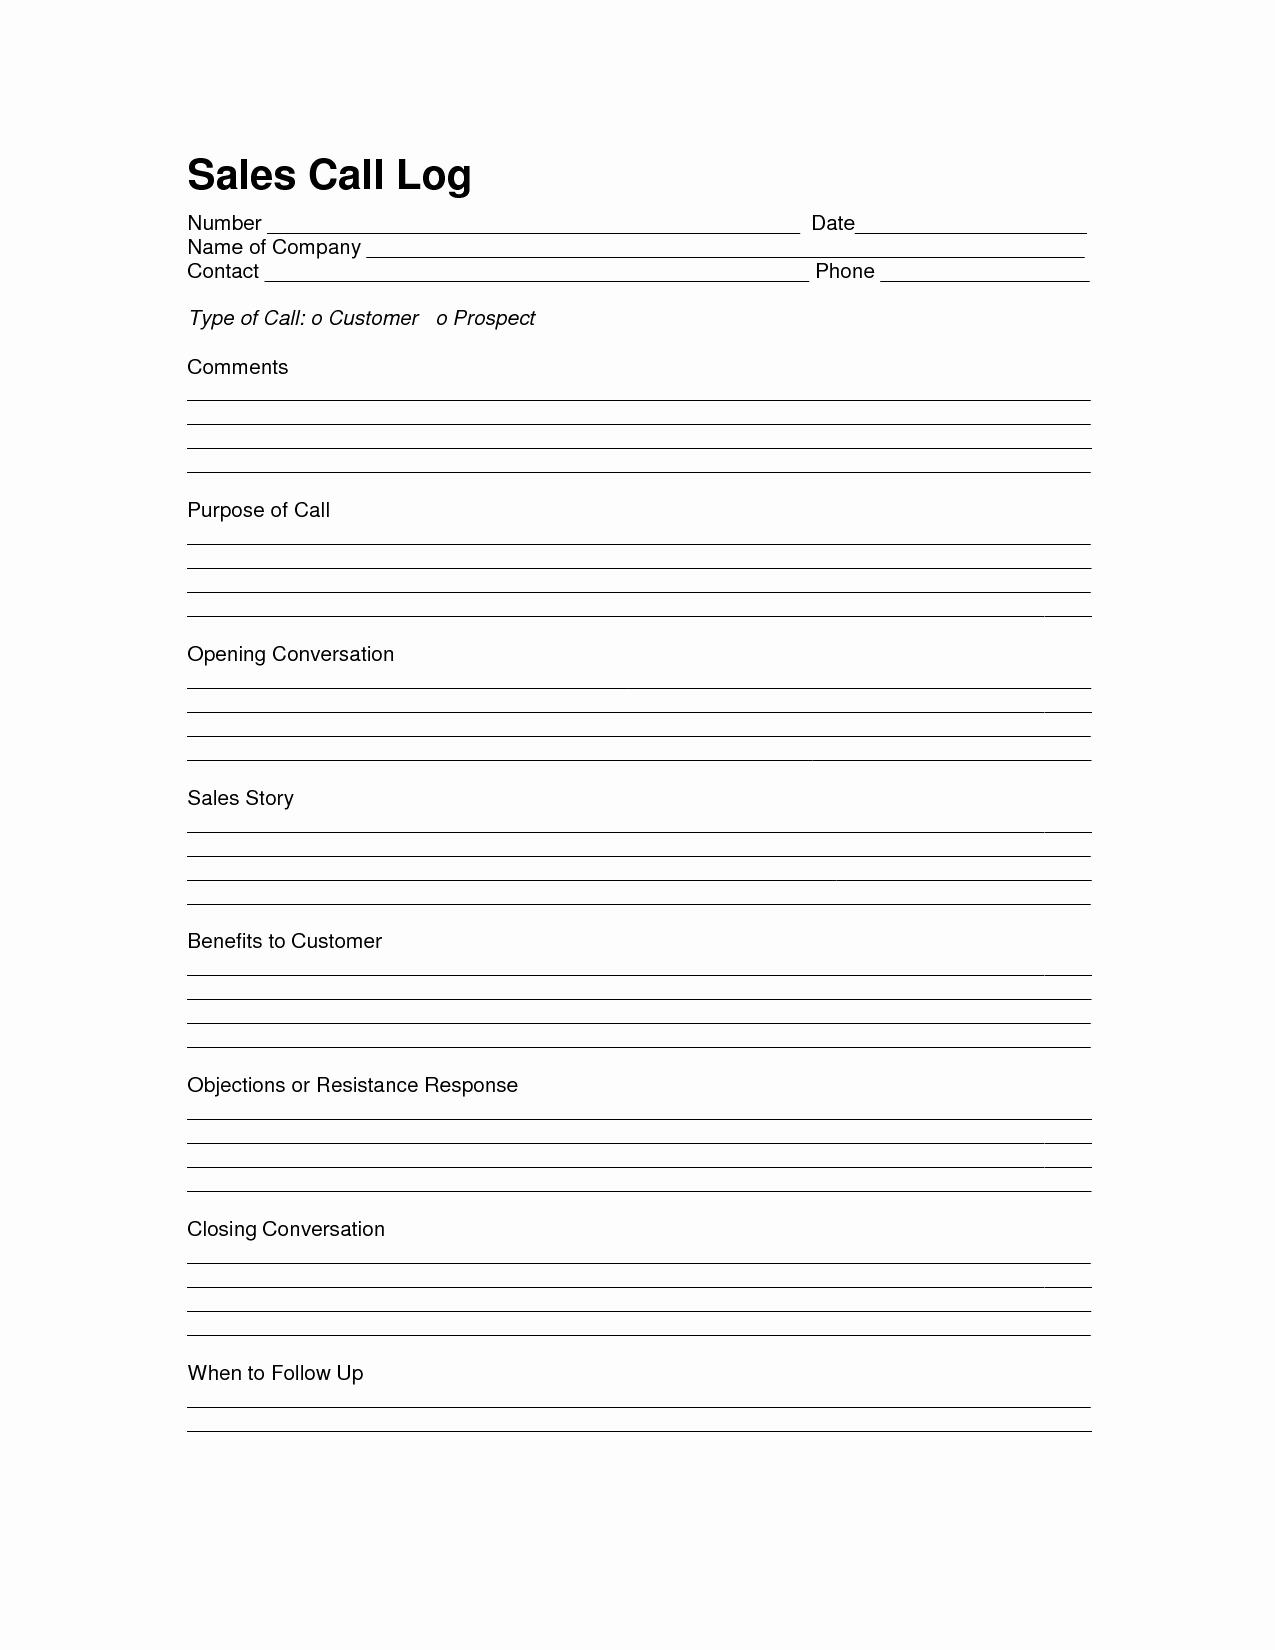 Sales Calls Report Template Luxury Sales Log Sheet Template Sales Call Log Template